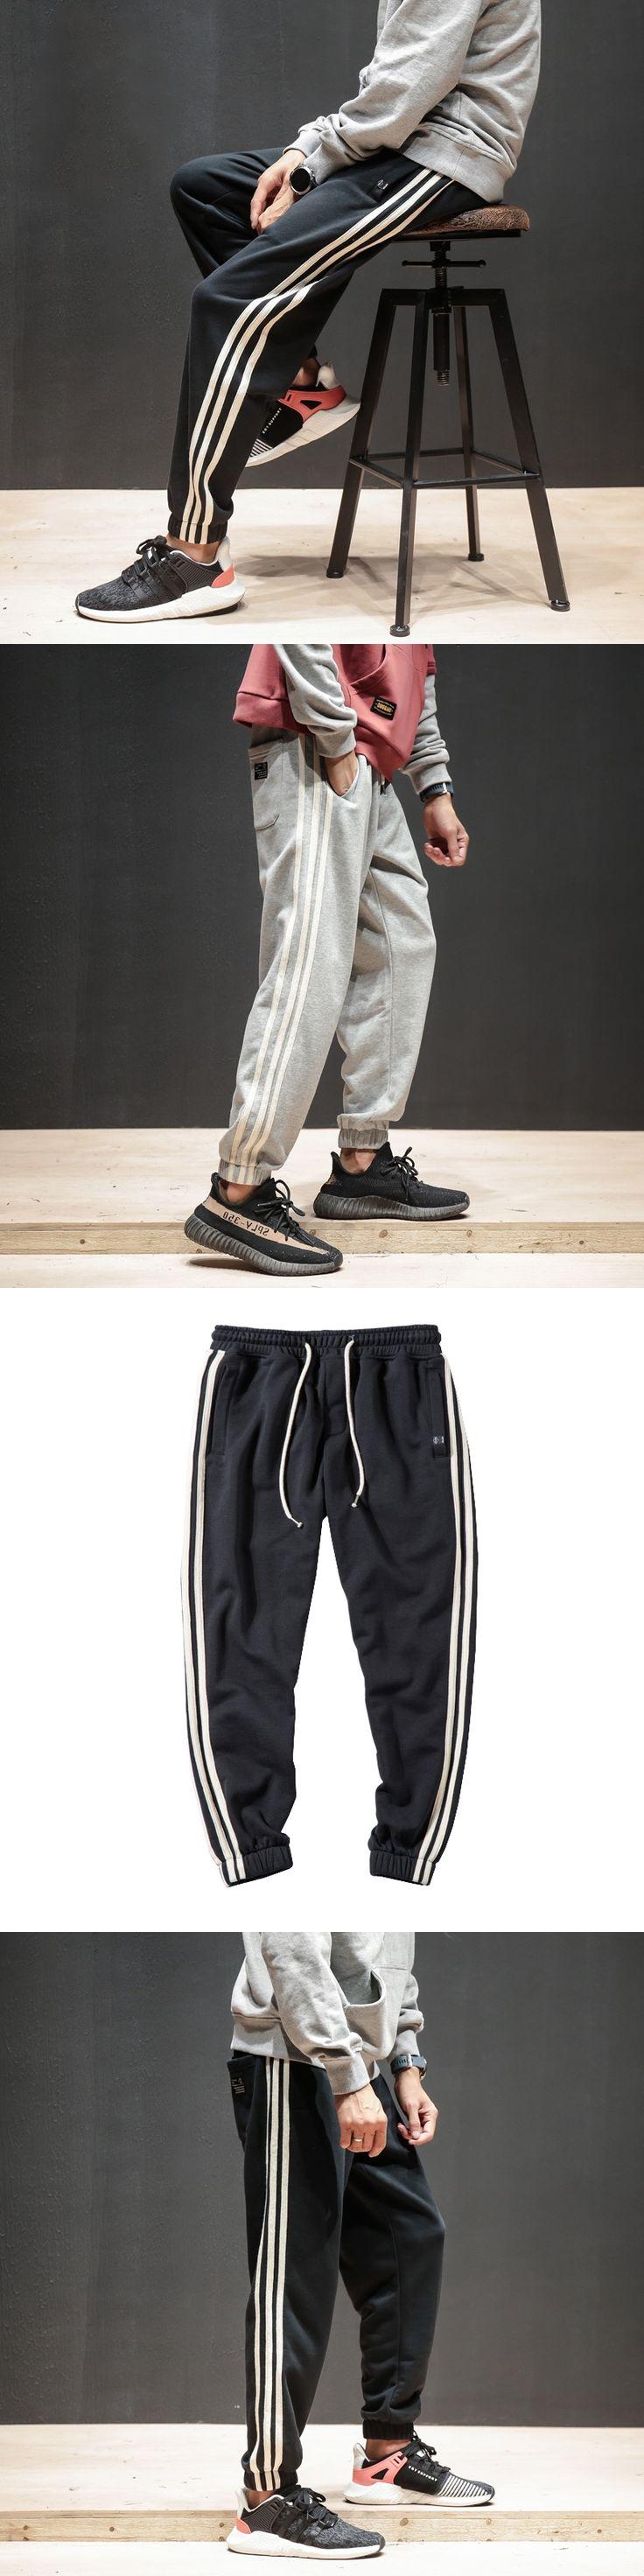 2017 New Casual Slacks Mens Joggers Strip Side Sportwear Mens Pants Highstreet Loose Trousers Pants For Men Plus Size M-5XL